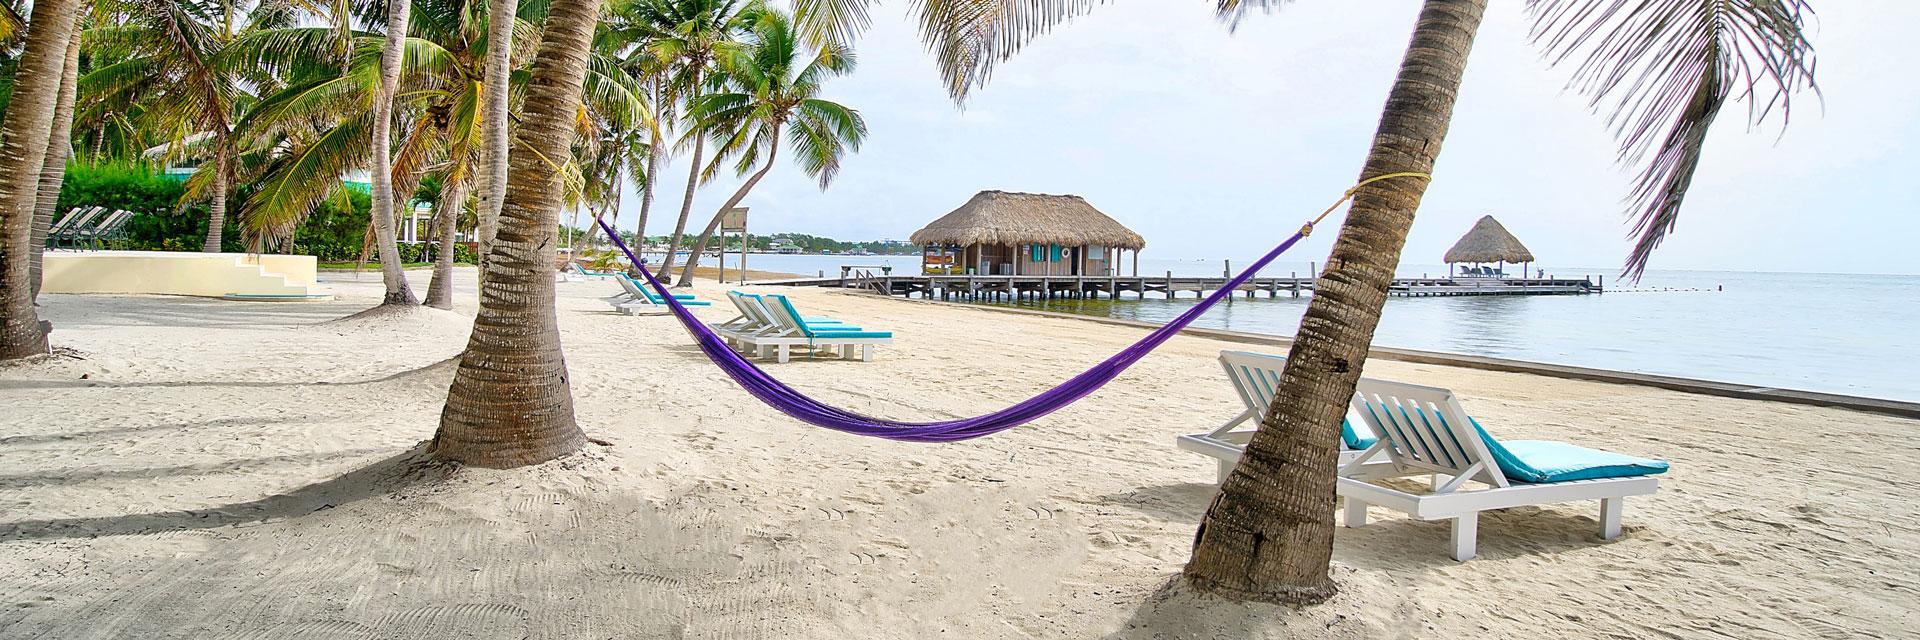 Beach Hammock - Victoria House Beach Resort